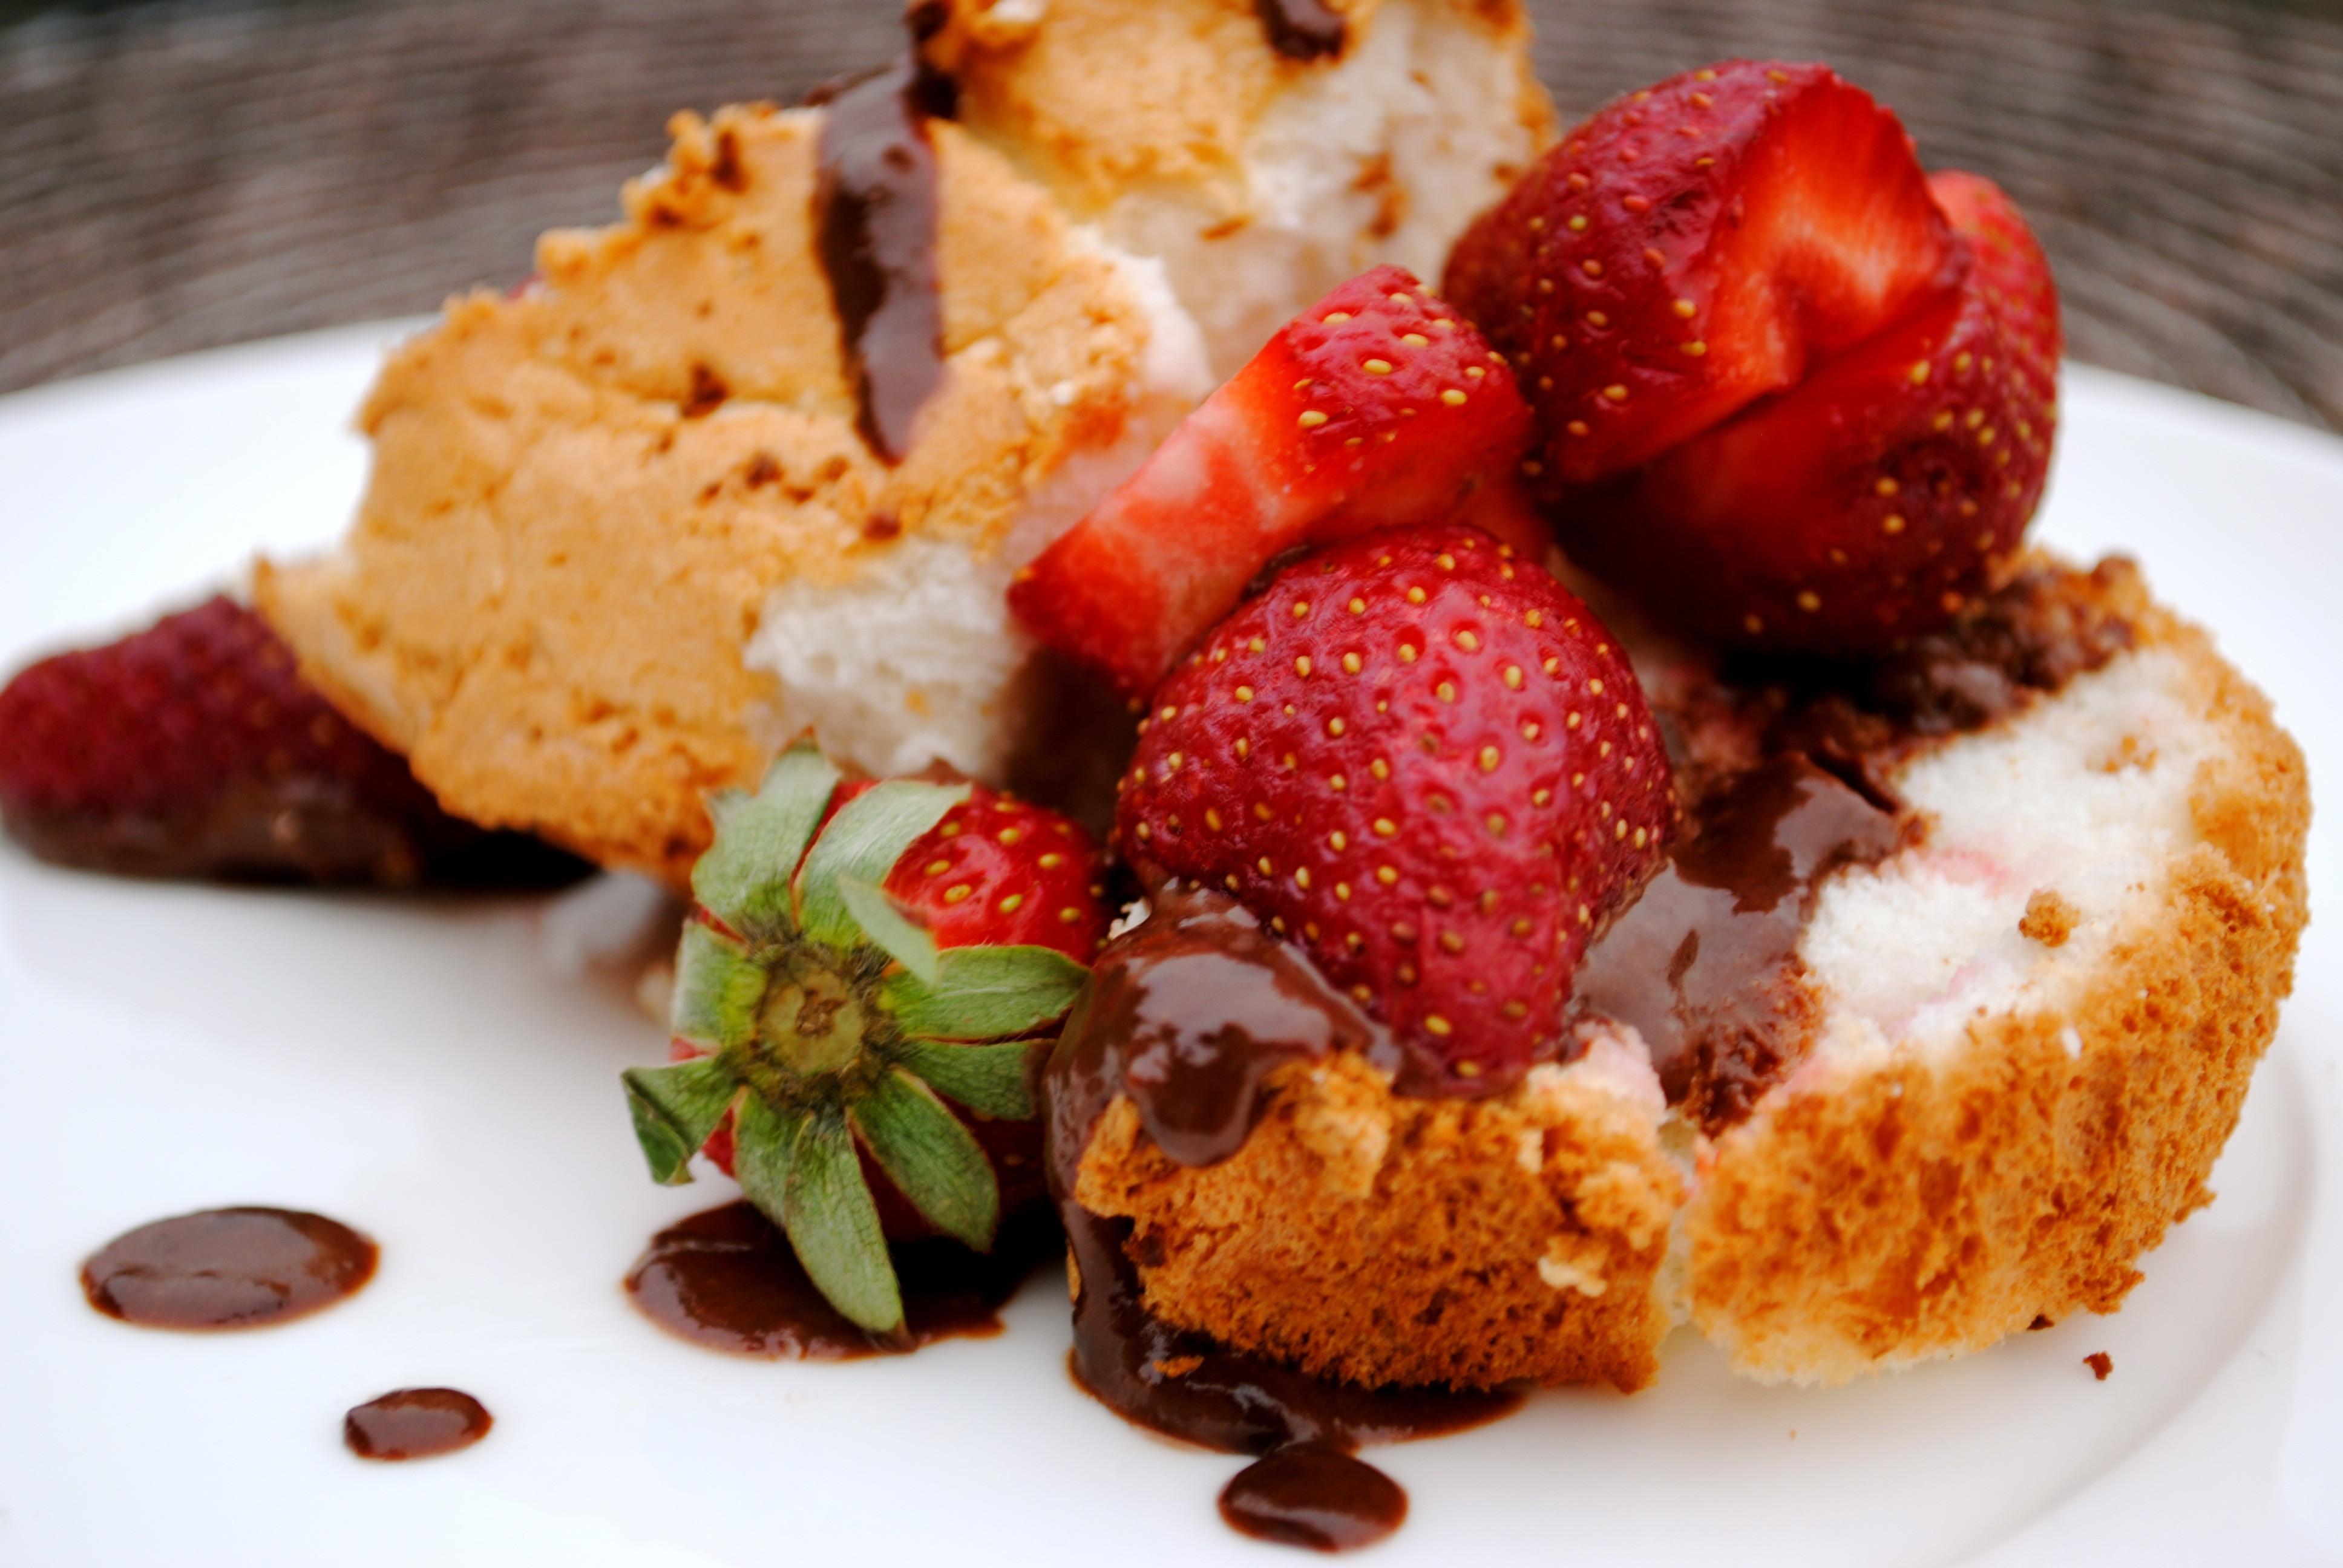 100 Calorie Desserts  A 100 Calorie Spring Dessert